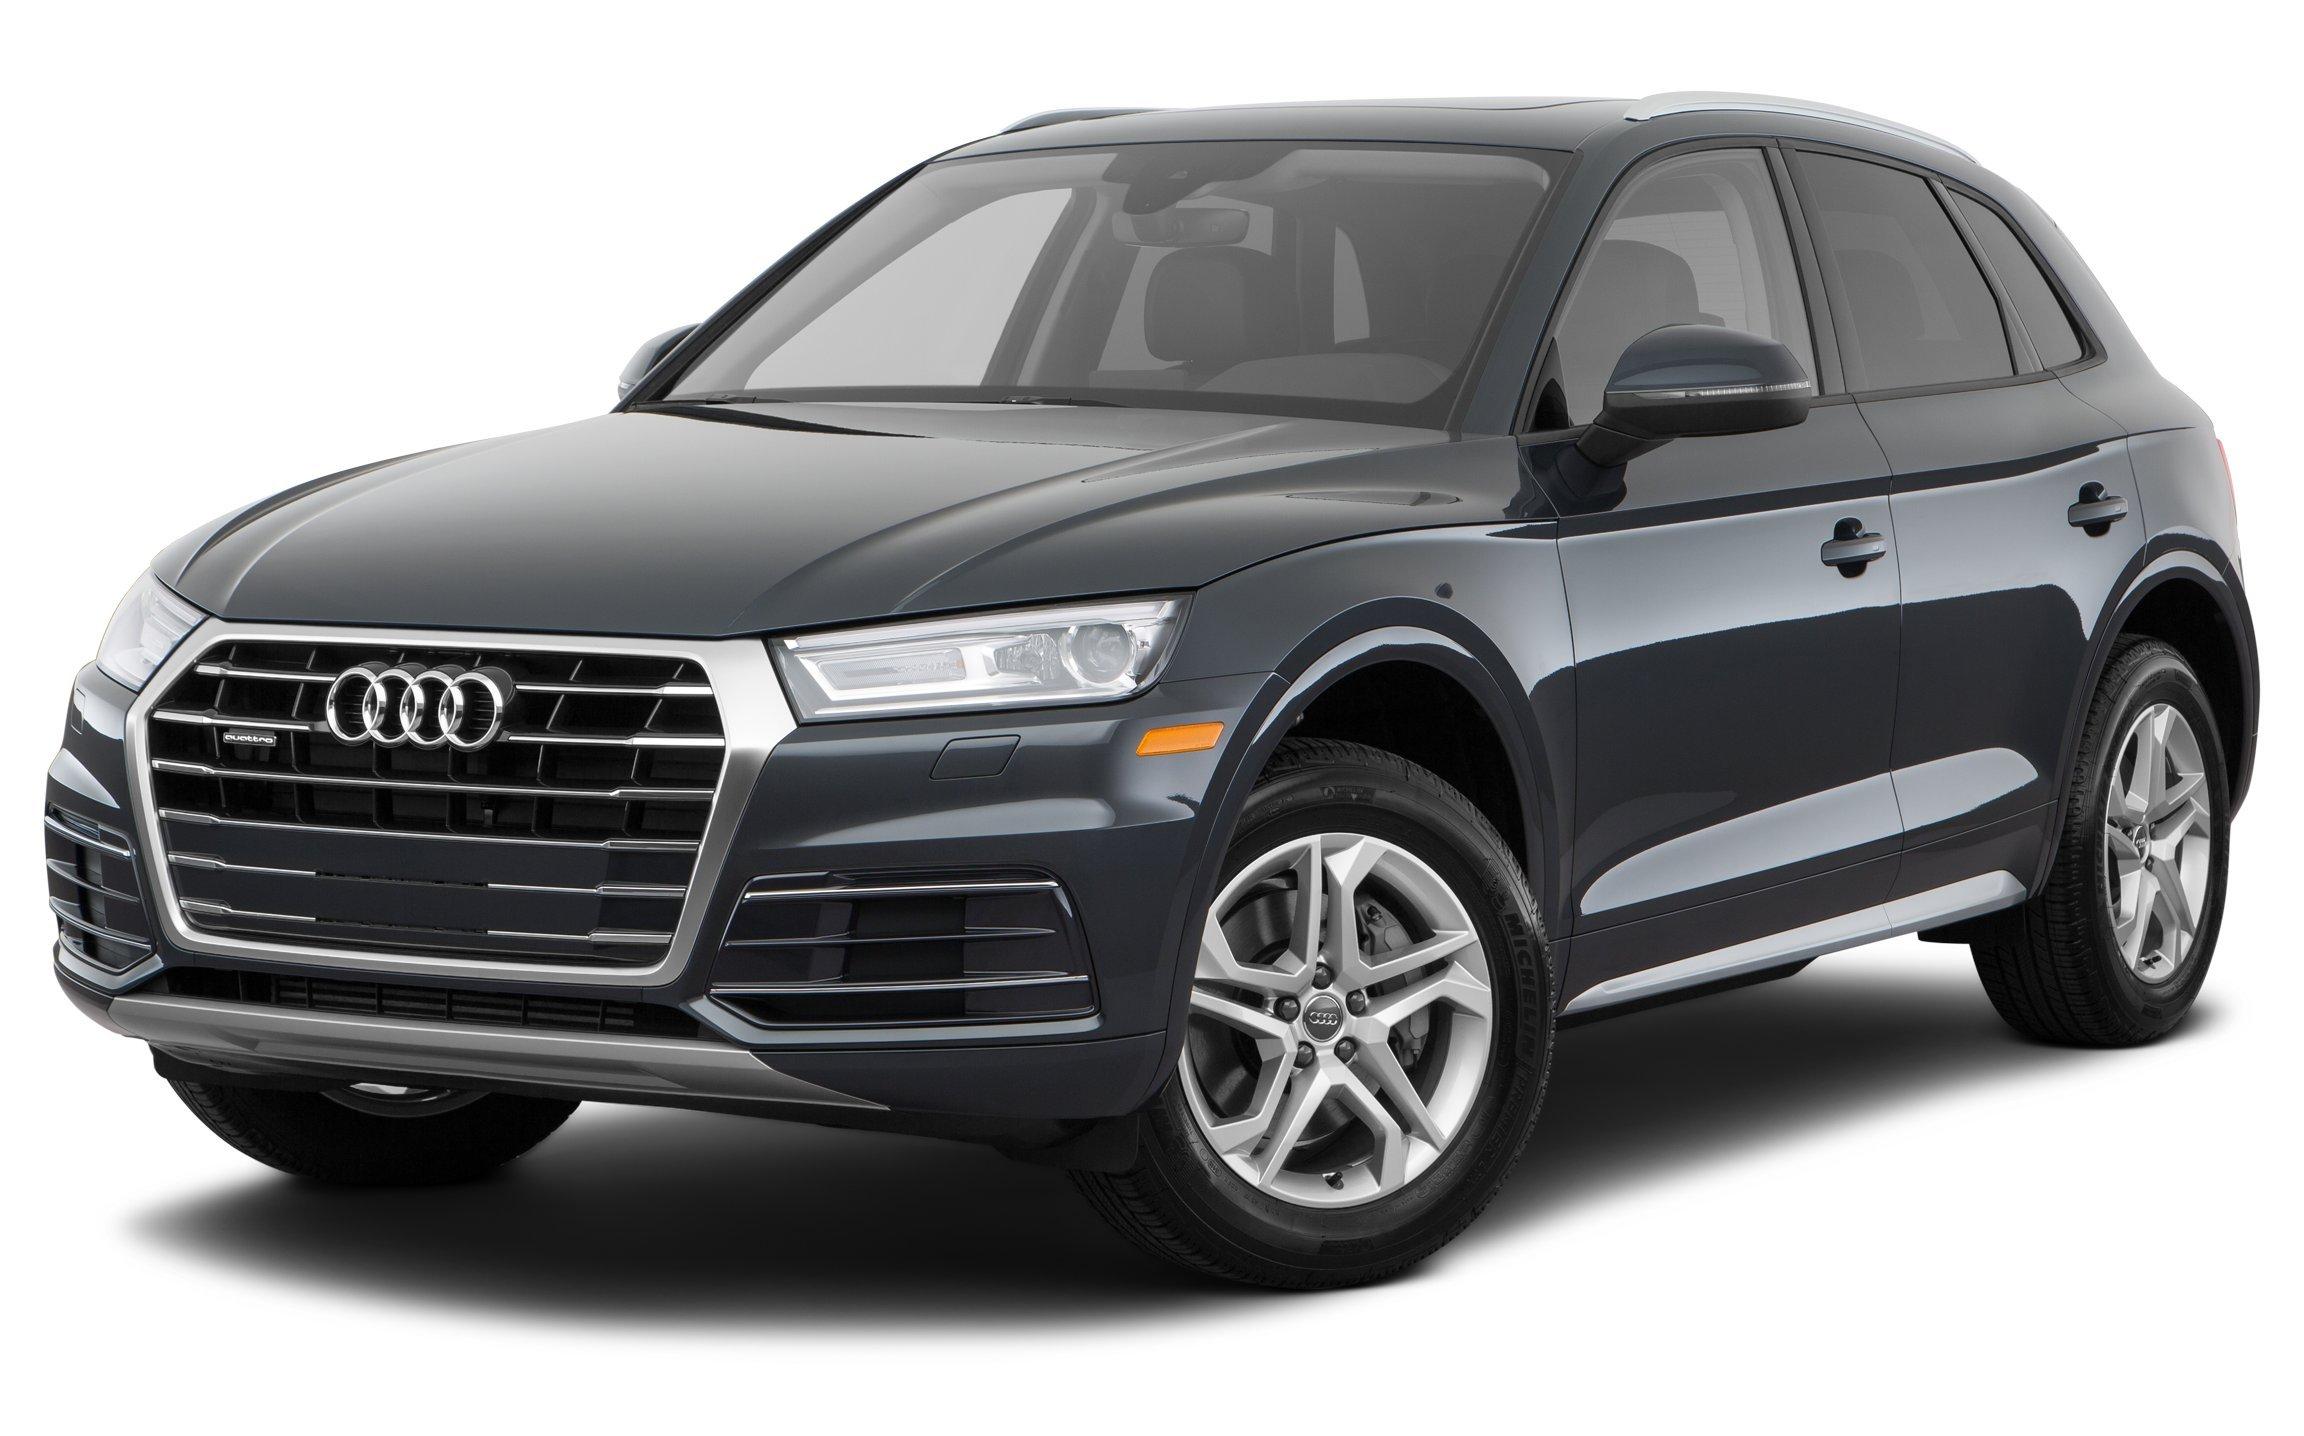 Amazon 2018 Audi Q5 Reviews and Specs Vehicles